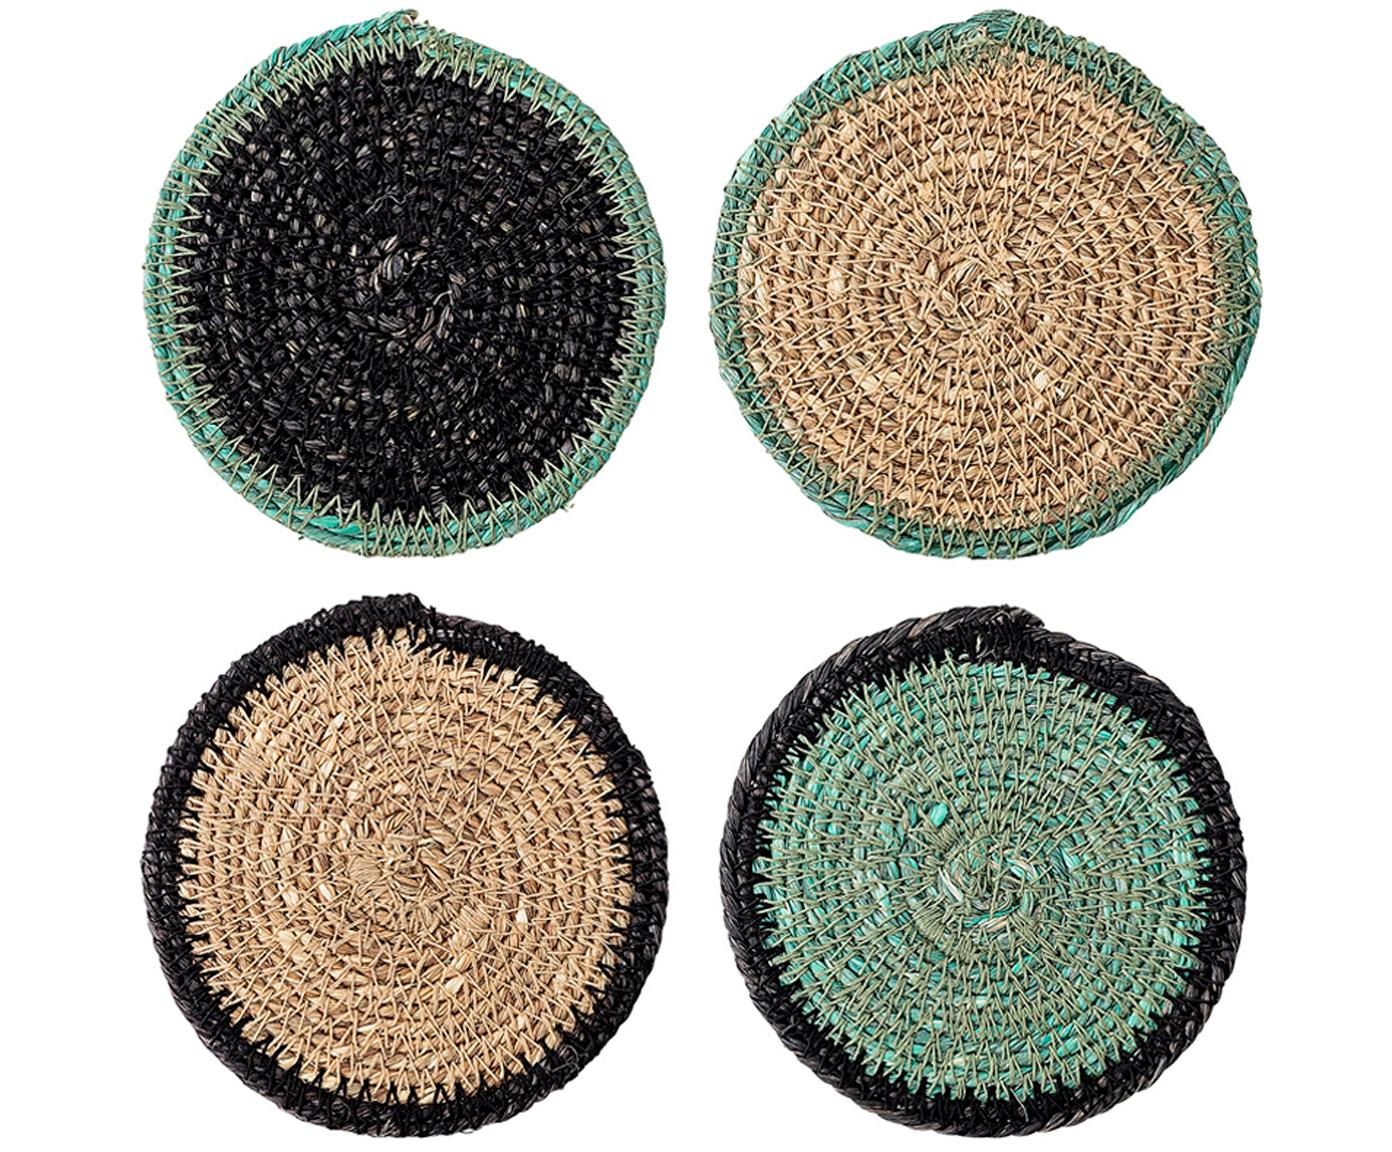 Set de posavasos de seagrass Costa, 5pzas., Seagrass, Beige, verde, negro, Ø 10 x Al 1 cm